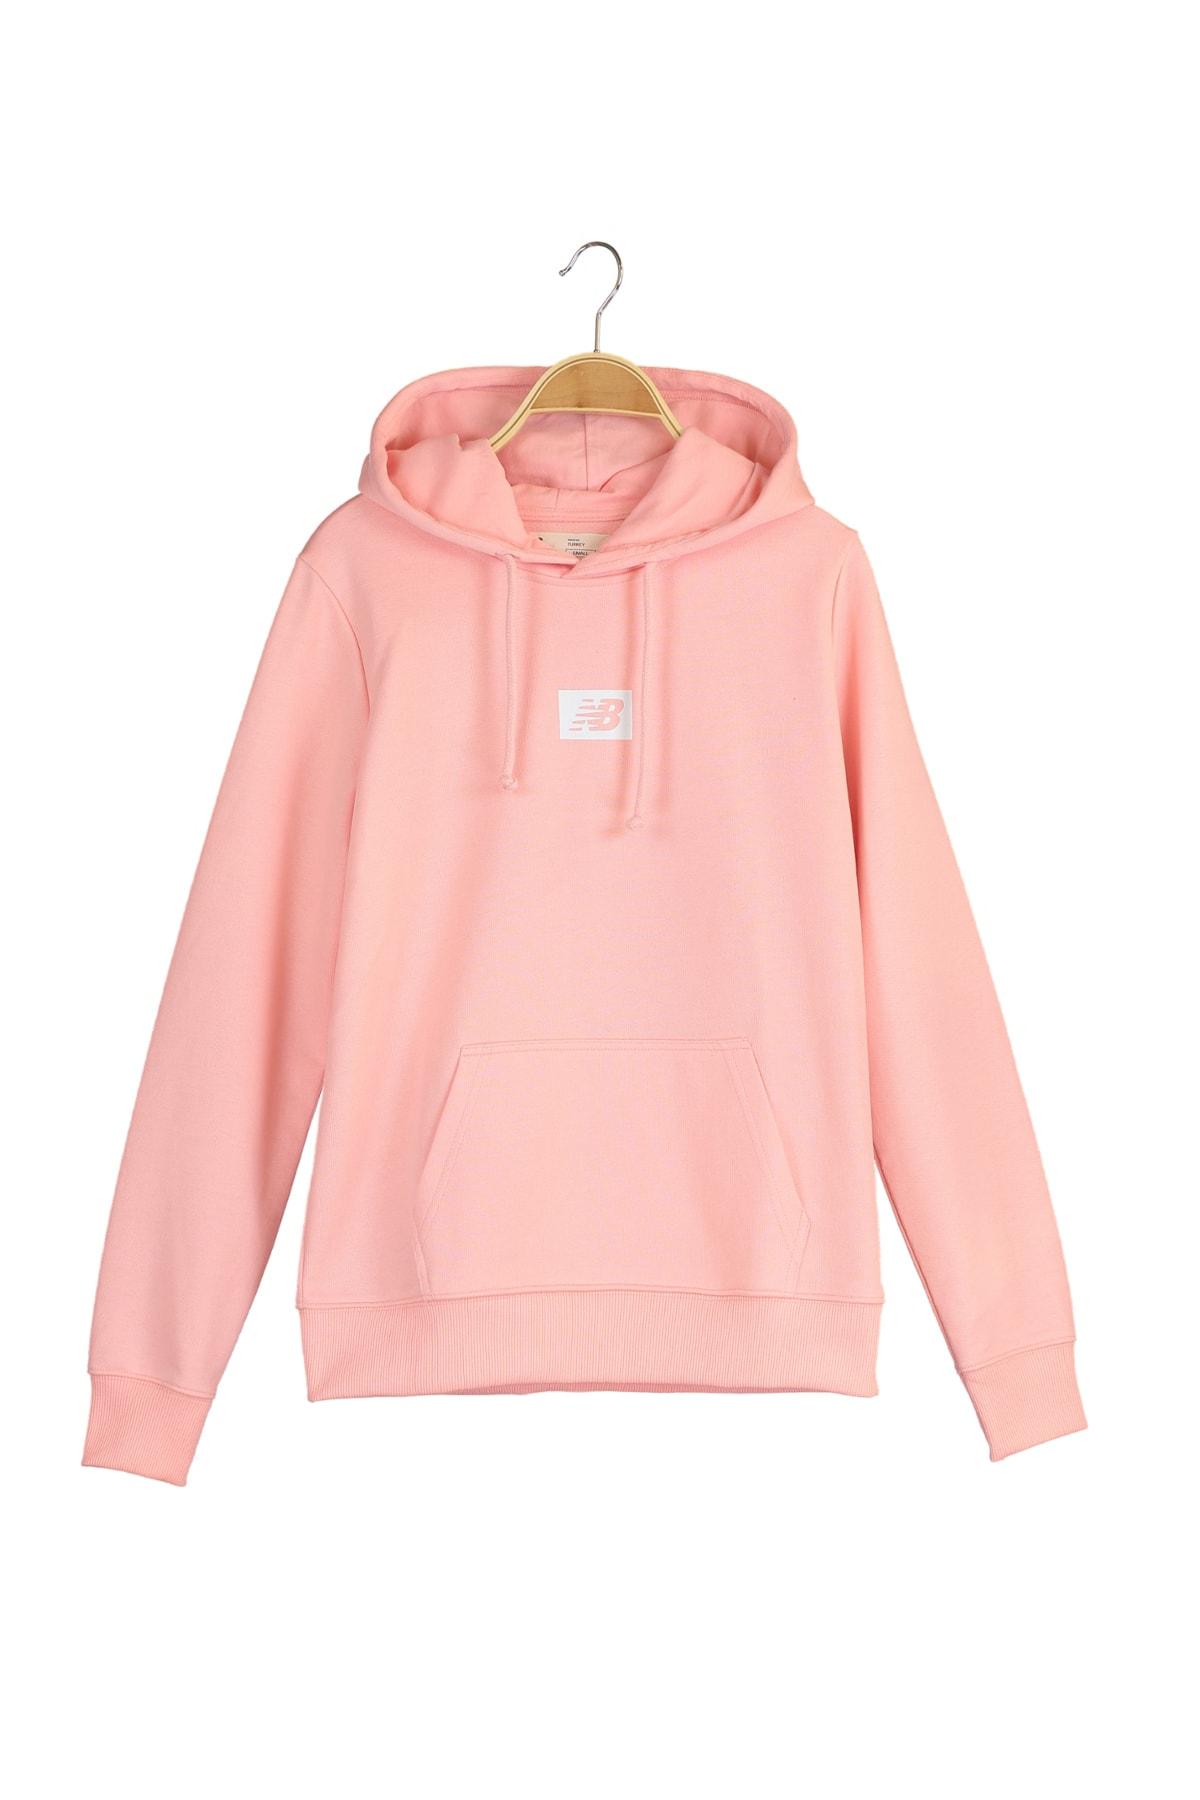 New Balance Kadın Sweatshirt - V-WTH804-FJI 1